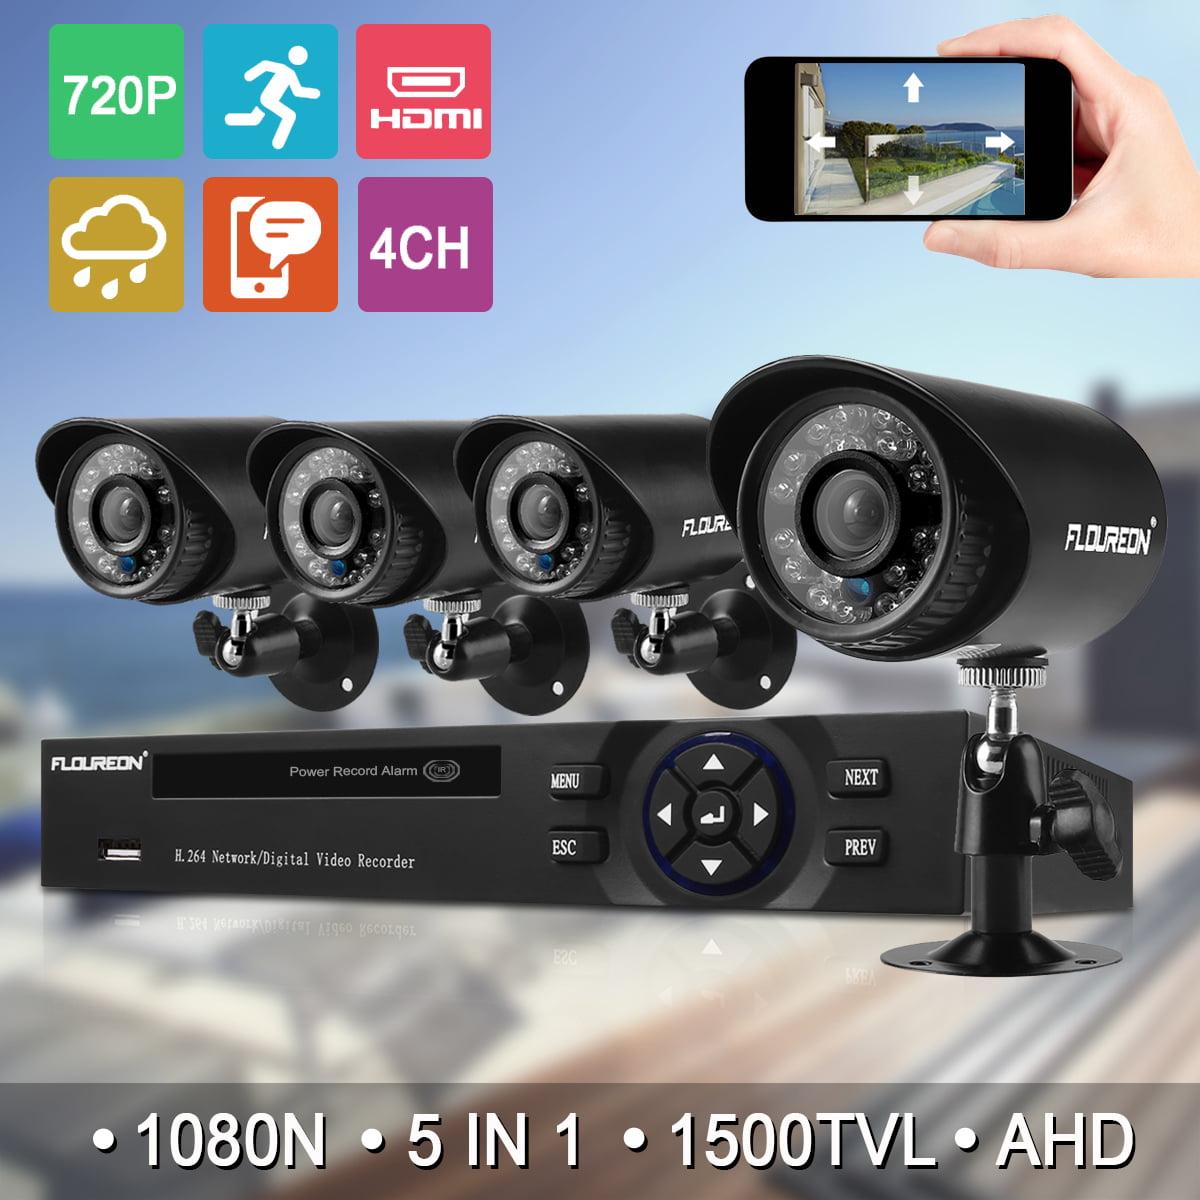 FLOUREON 1X 4CH 1080N 5 IN 1 HDMI AHD DVR + 4X Outdoor 1500TVL 720P 1.0MP CMOS IP Camera Security Kit Night Vision US